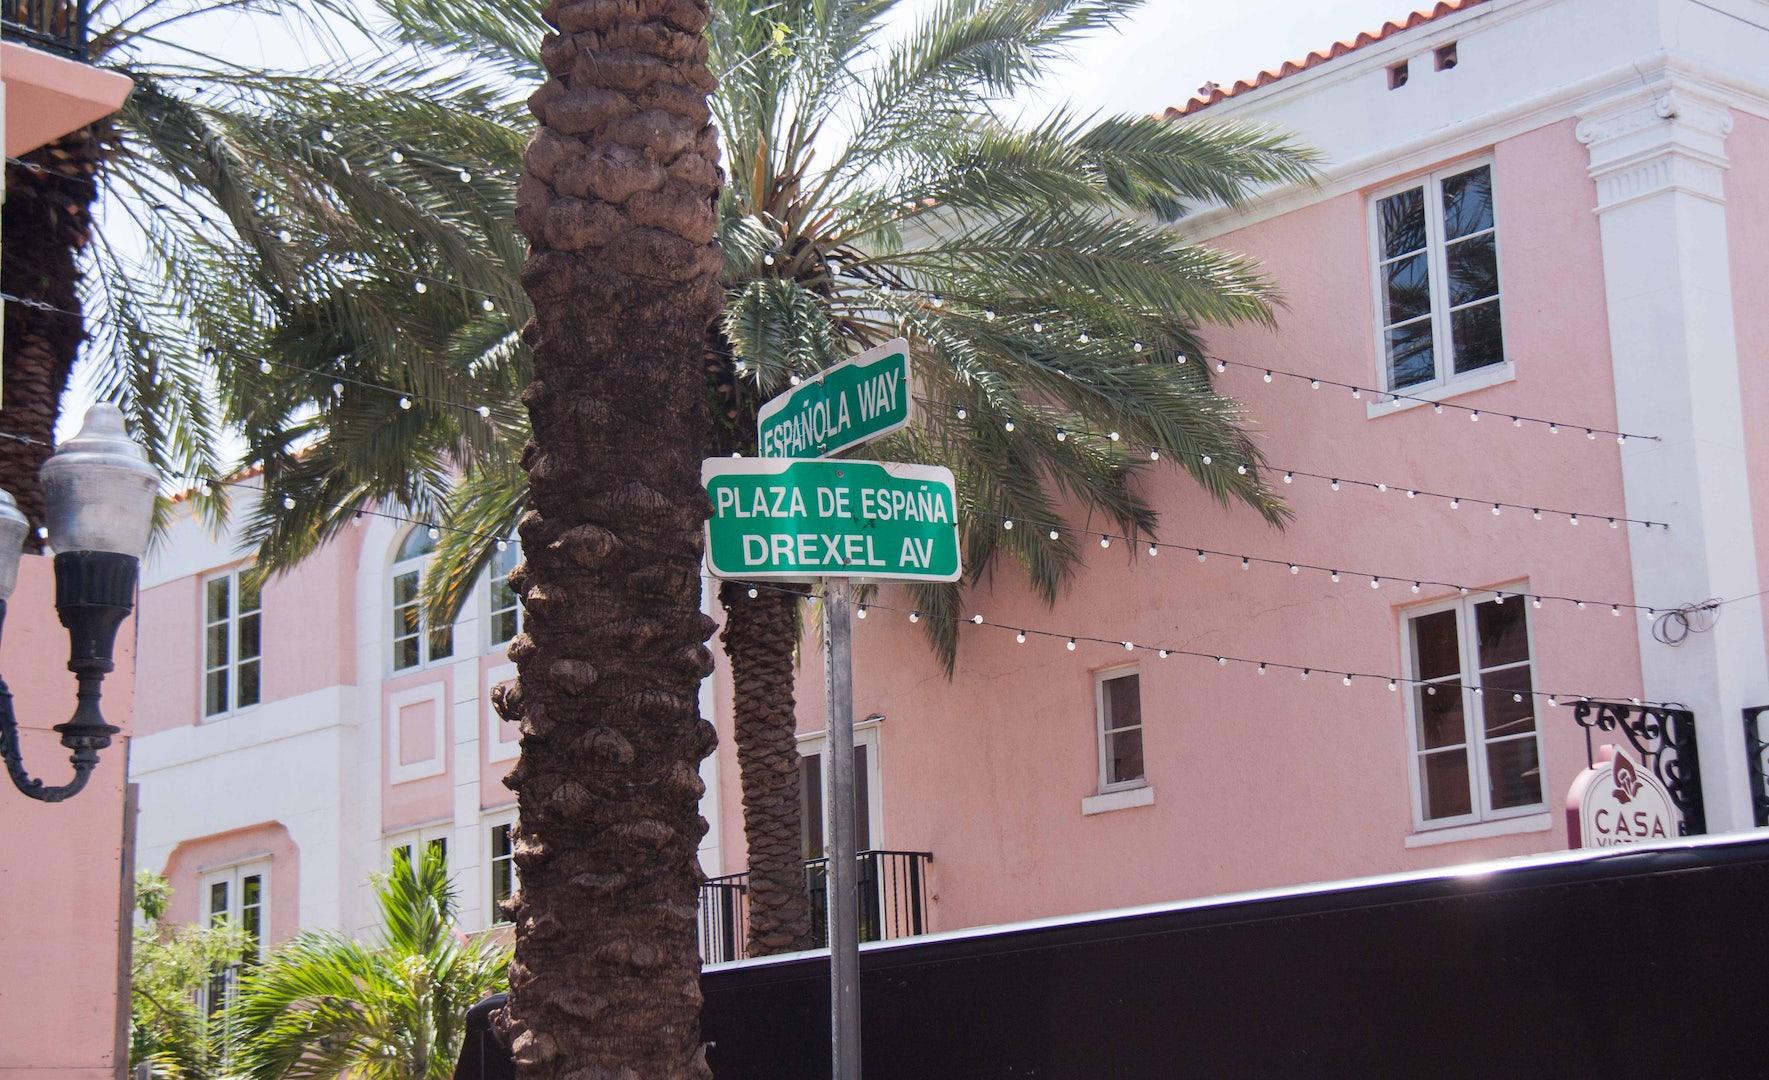 a pink house at Española way in Miami